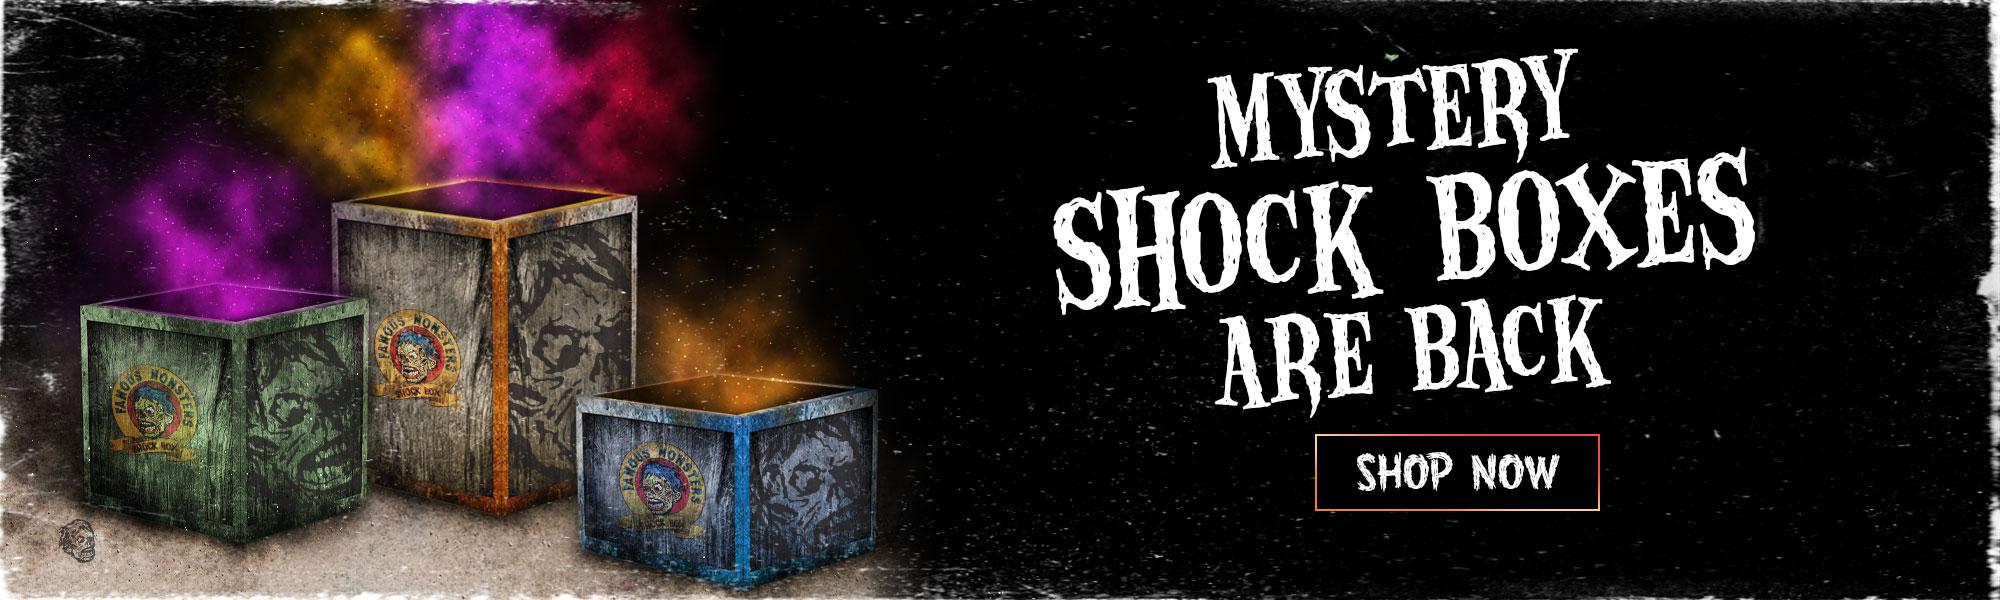 mystery-shock-box-slider.jpg